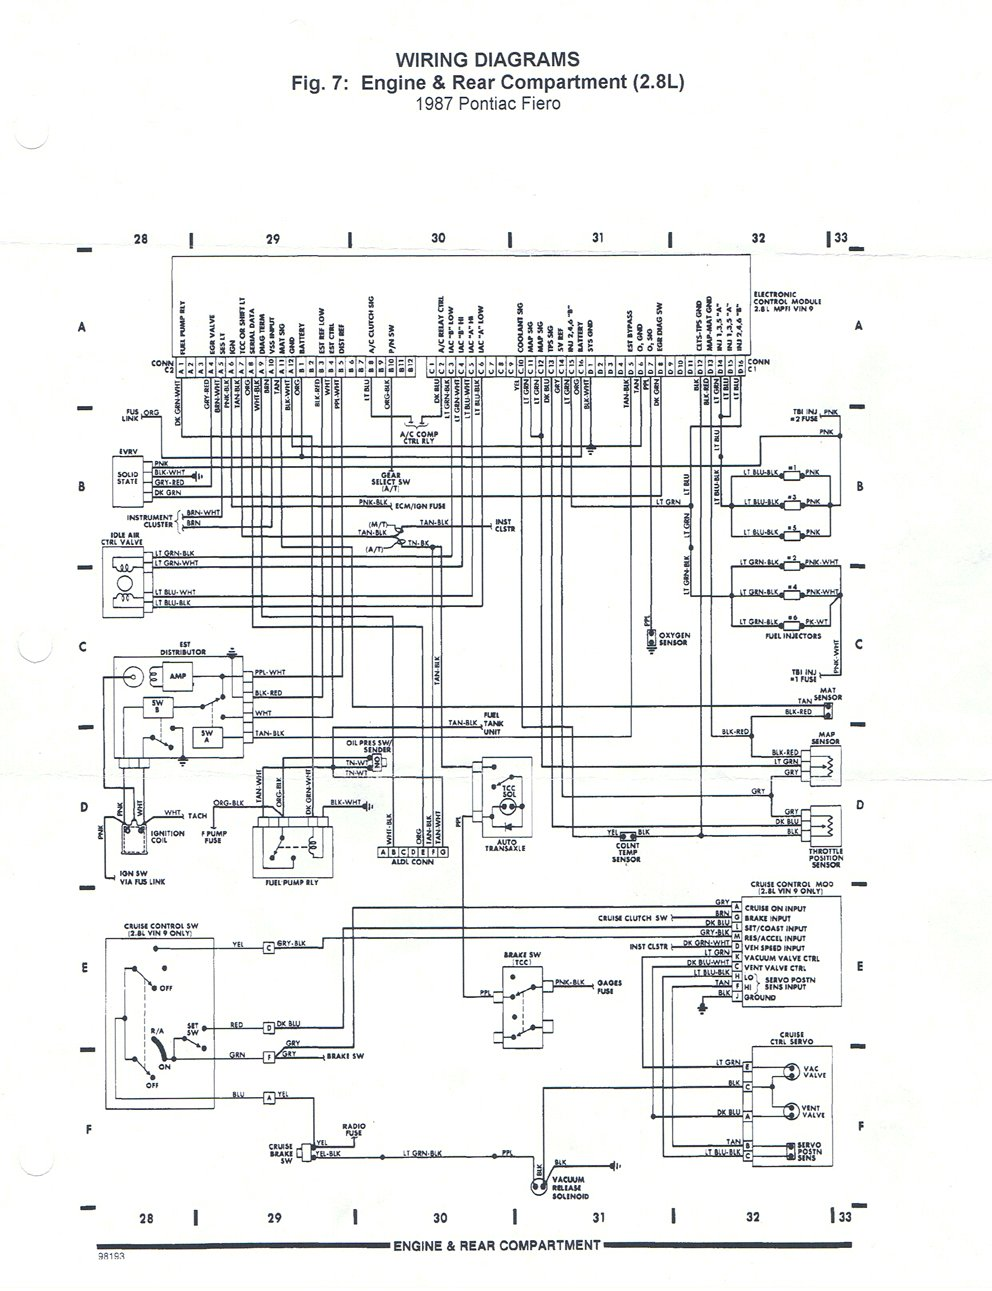 spartan motor wiring diagram ats panel genset controller Tao Wiring Diagrams